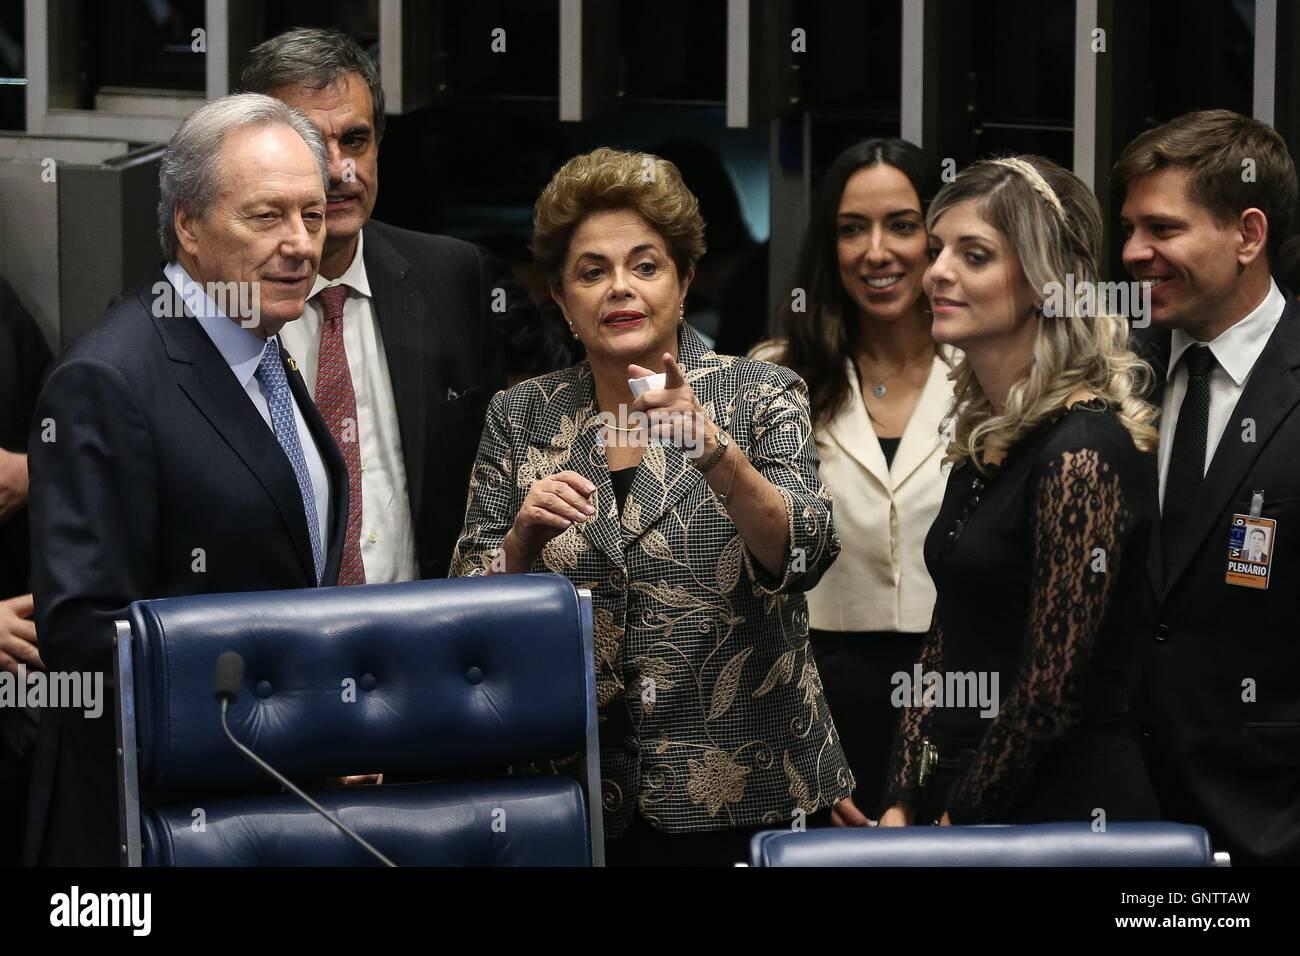 Brazilian President Dilma Rousseff during the impeachment trial in the Brazilian Senate August 29, 2016 in Brasilia, - Stock Image